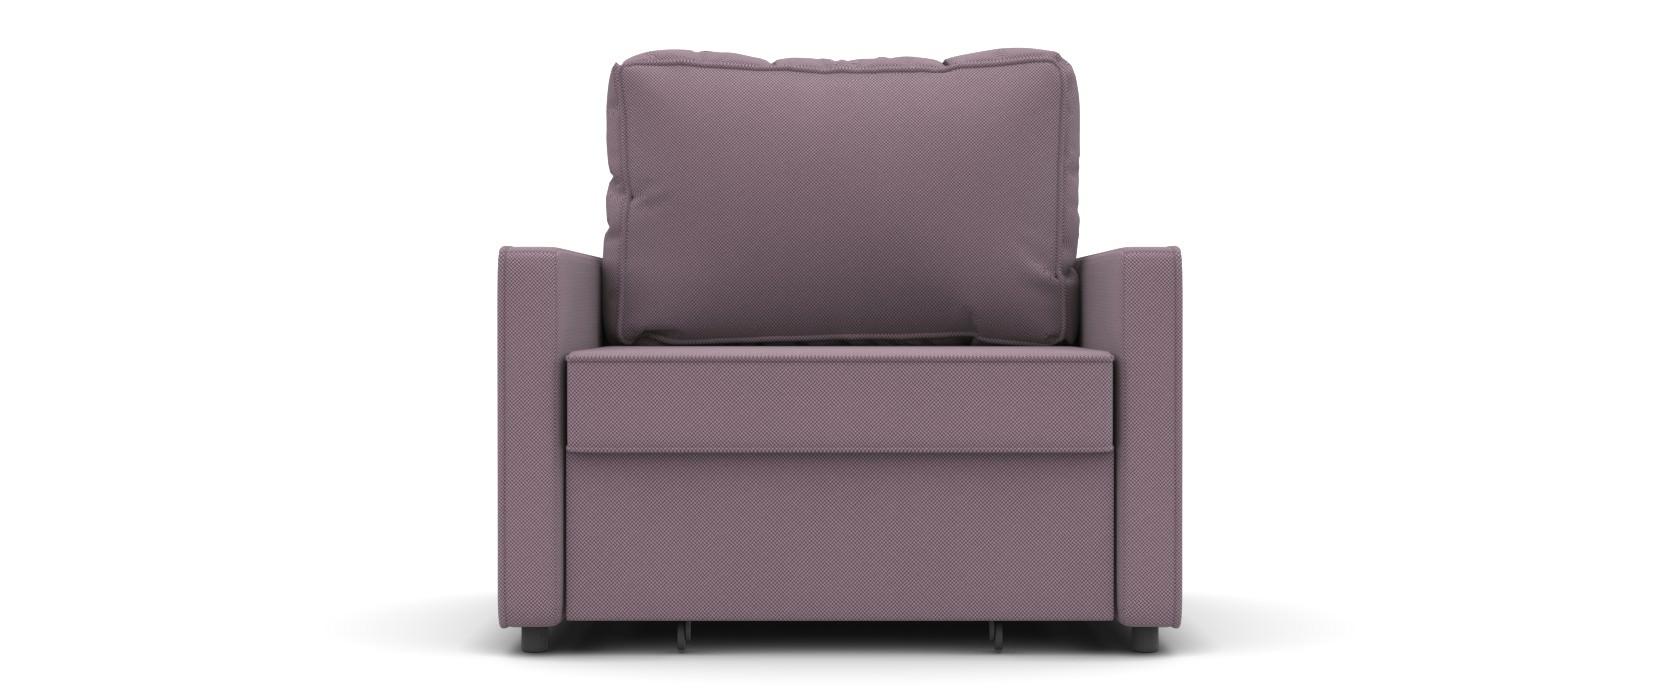 Розкладне крісло Mattone - Pufetto